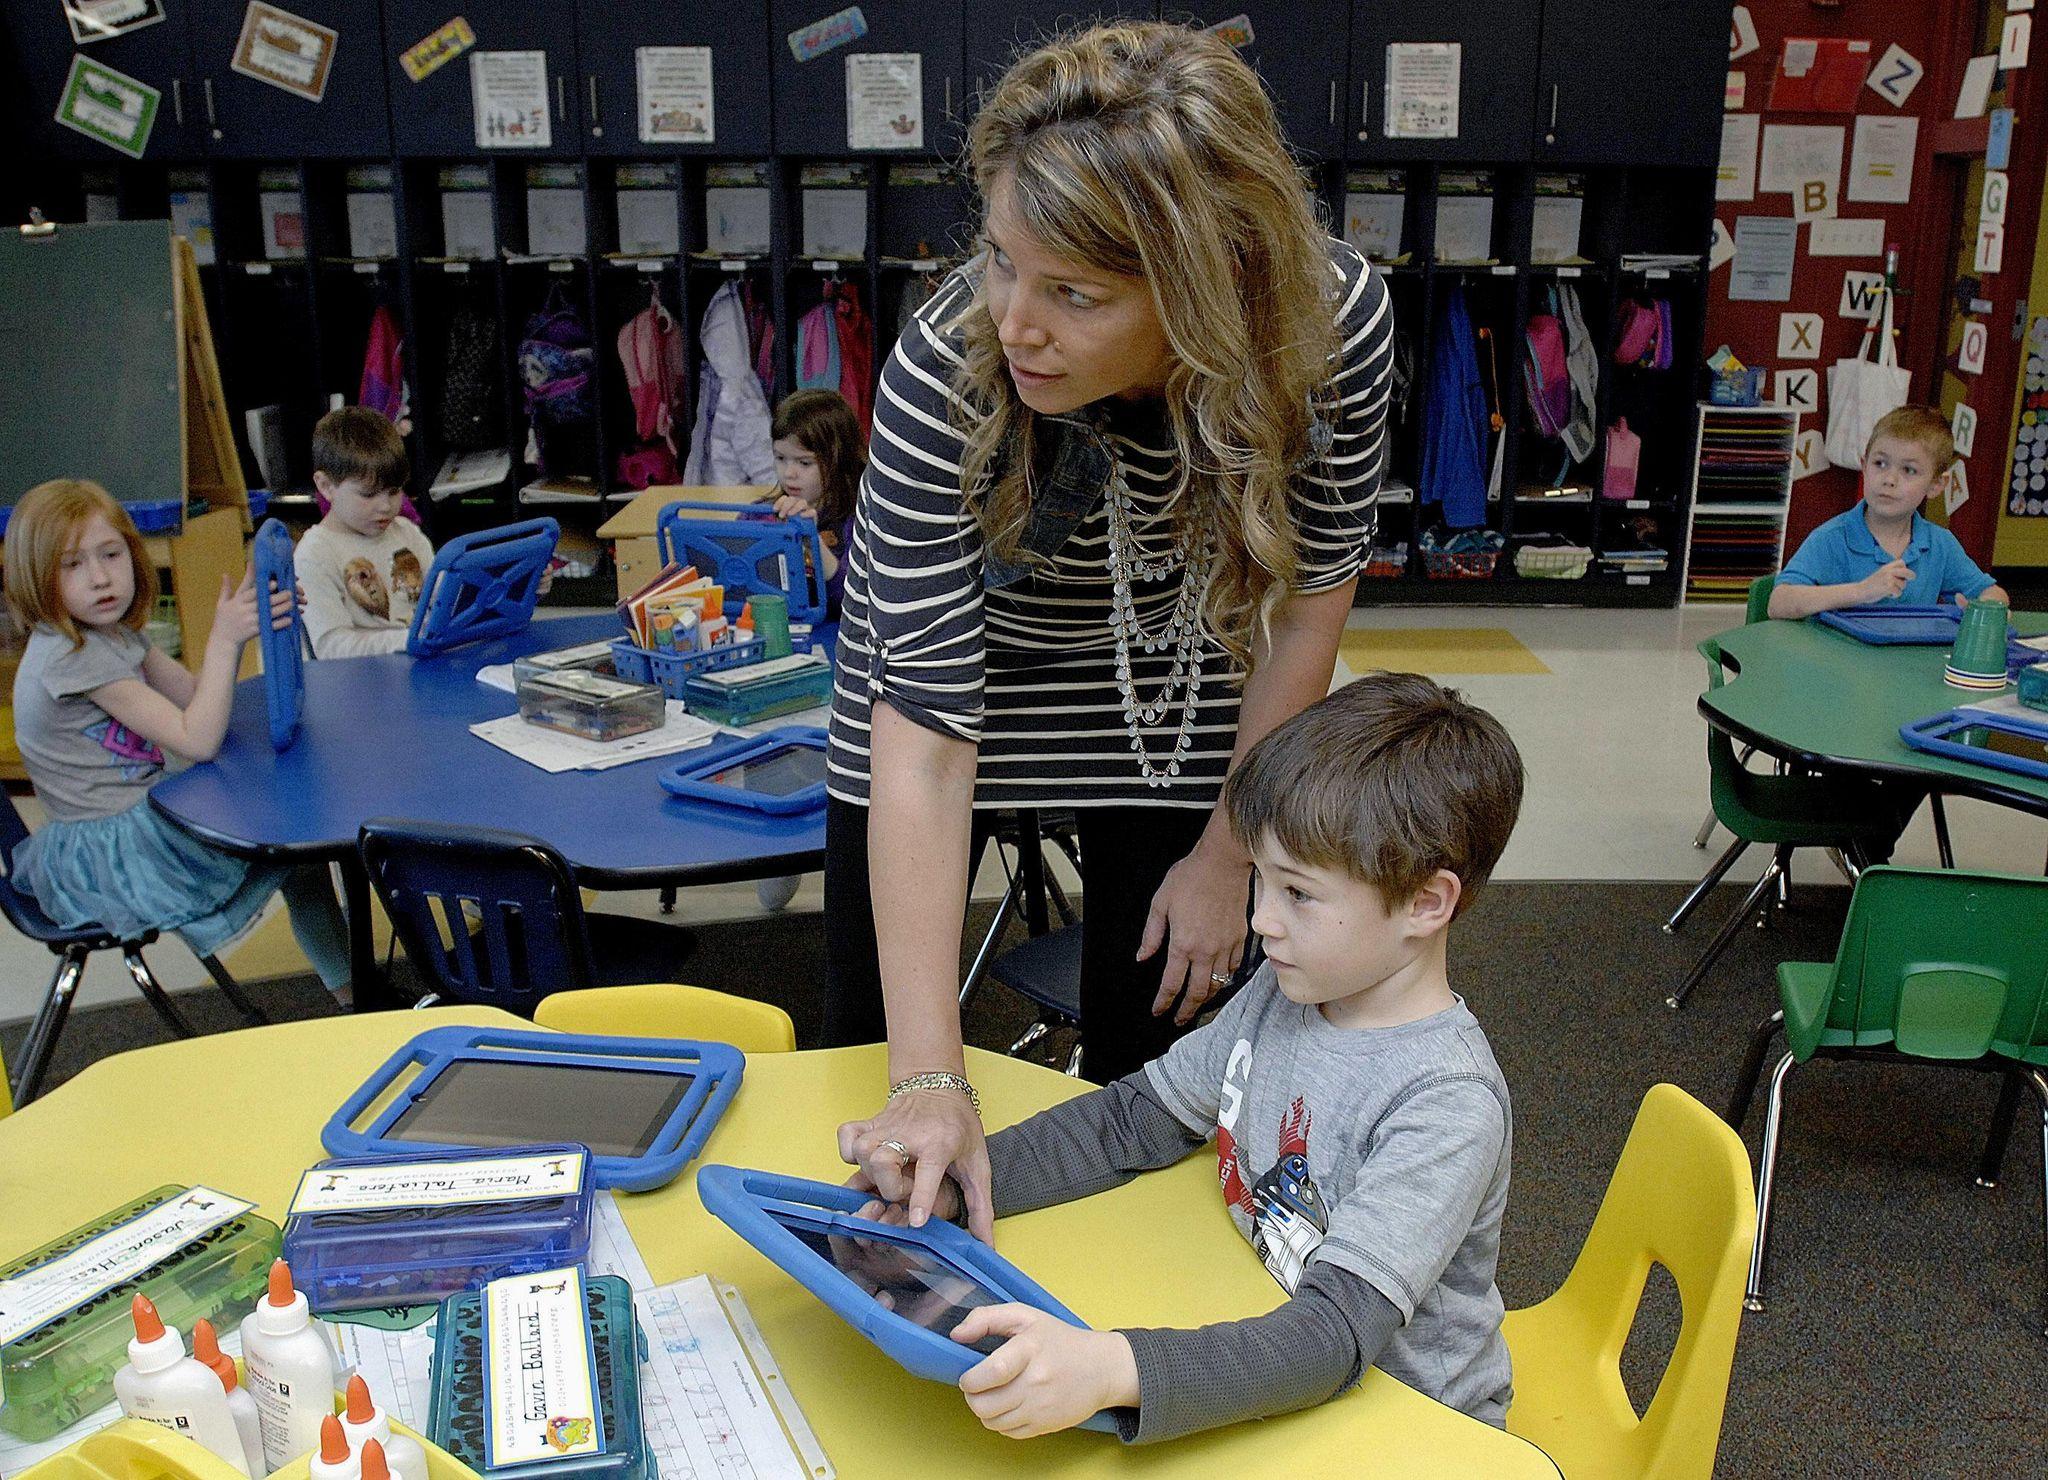 EXCHANGE: Educators weave technology into curriculum